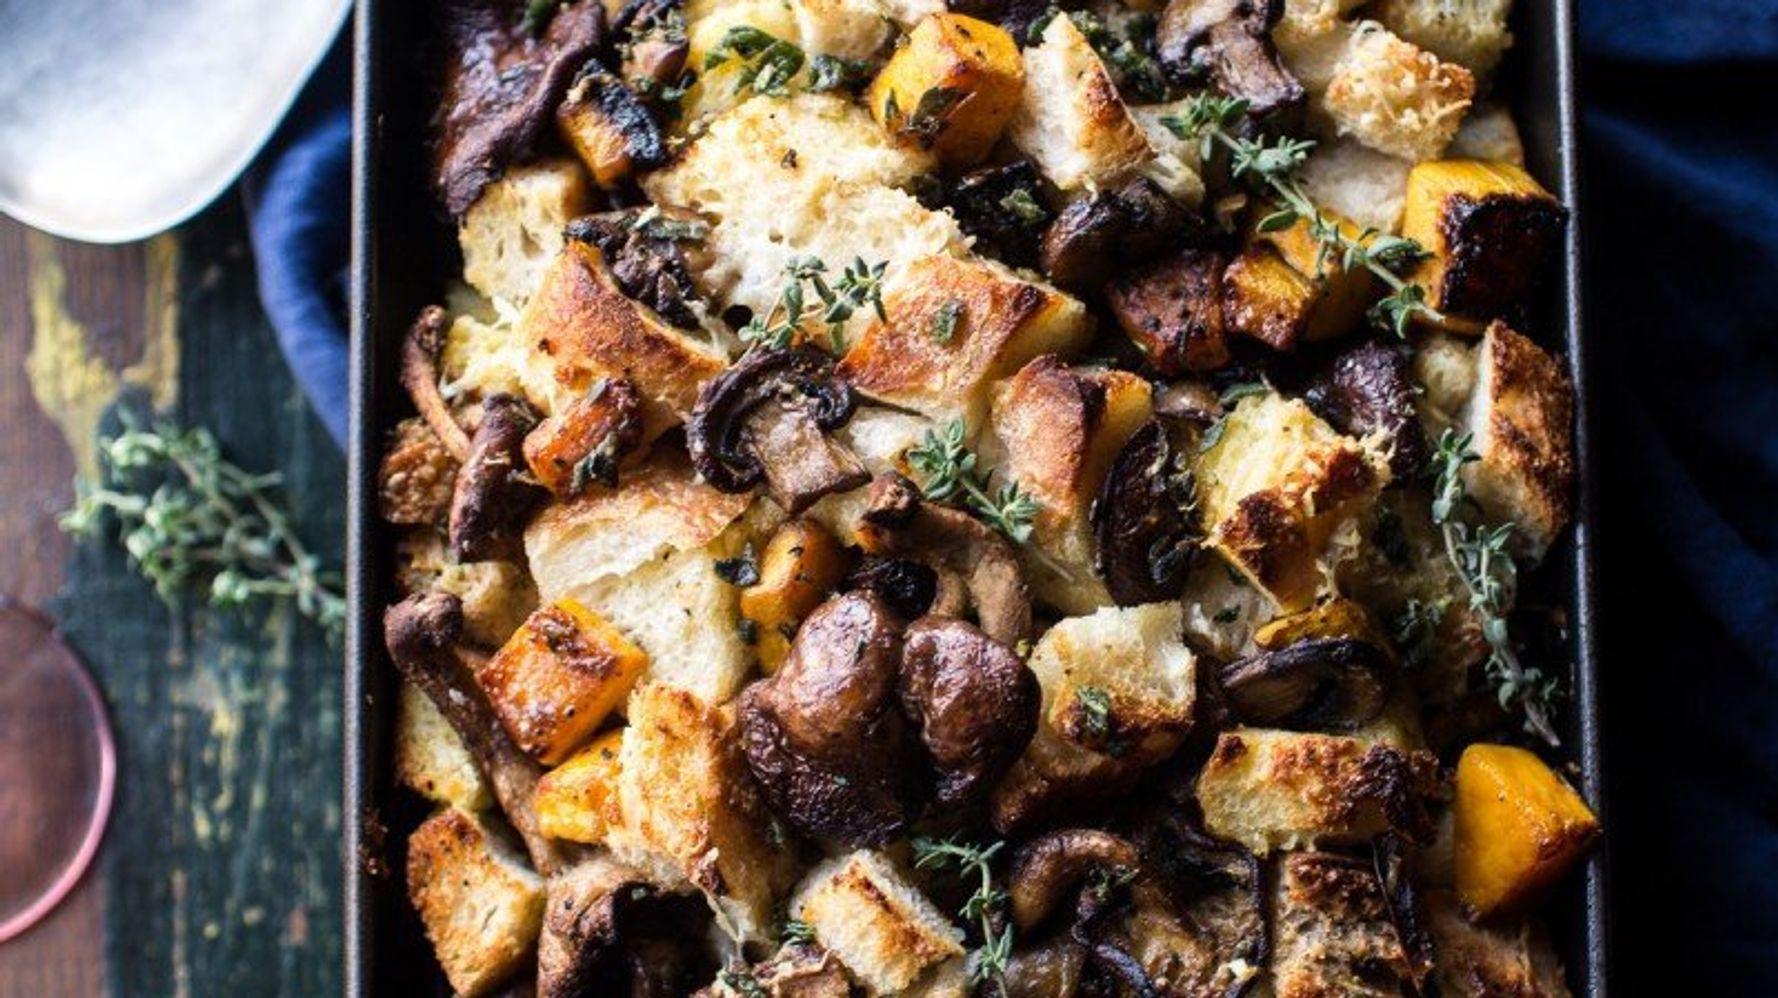 The Best Stuffing Recipes For Thanksgiving Dinner